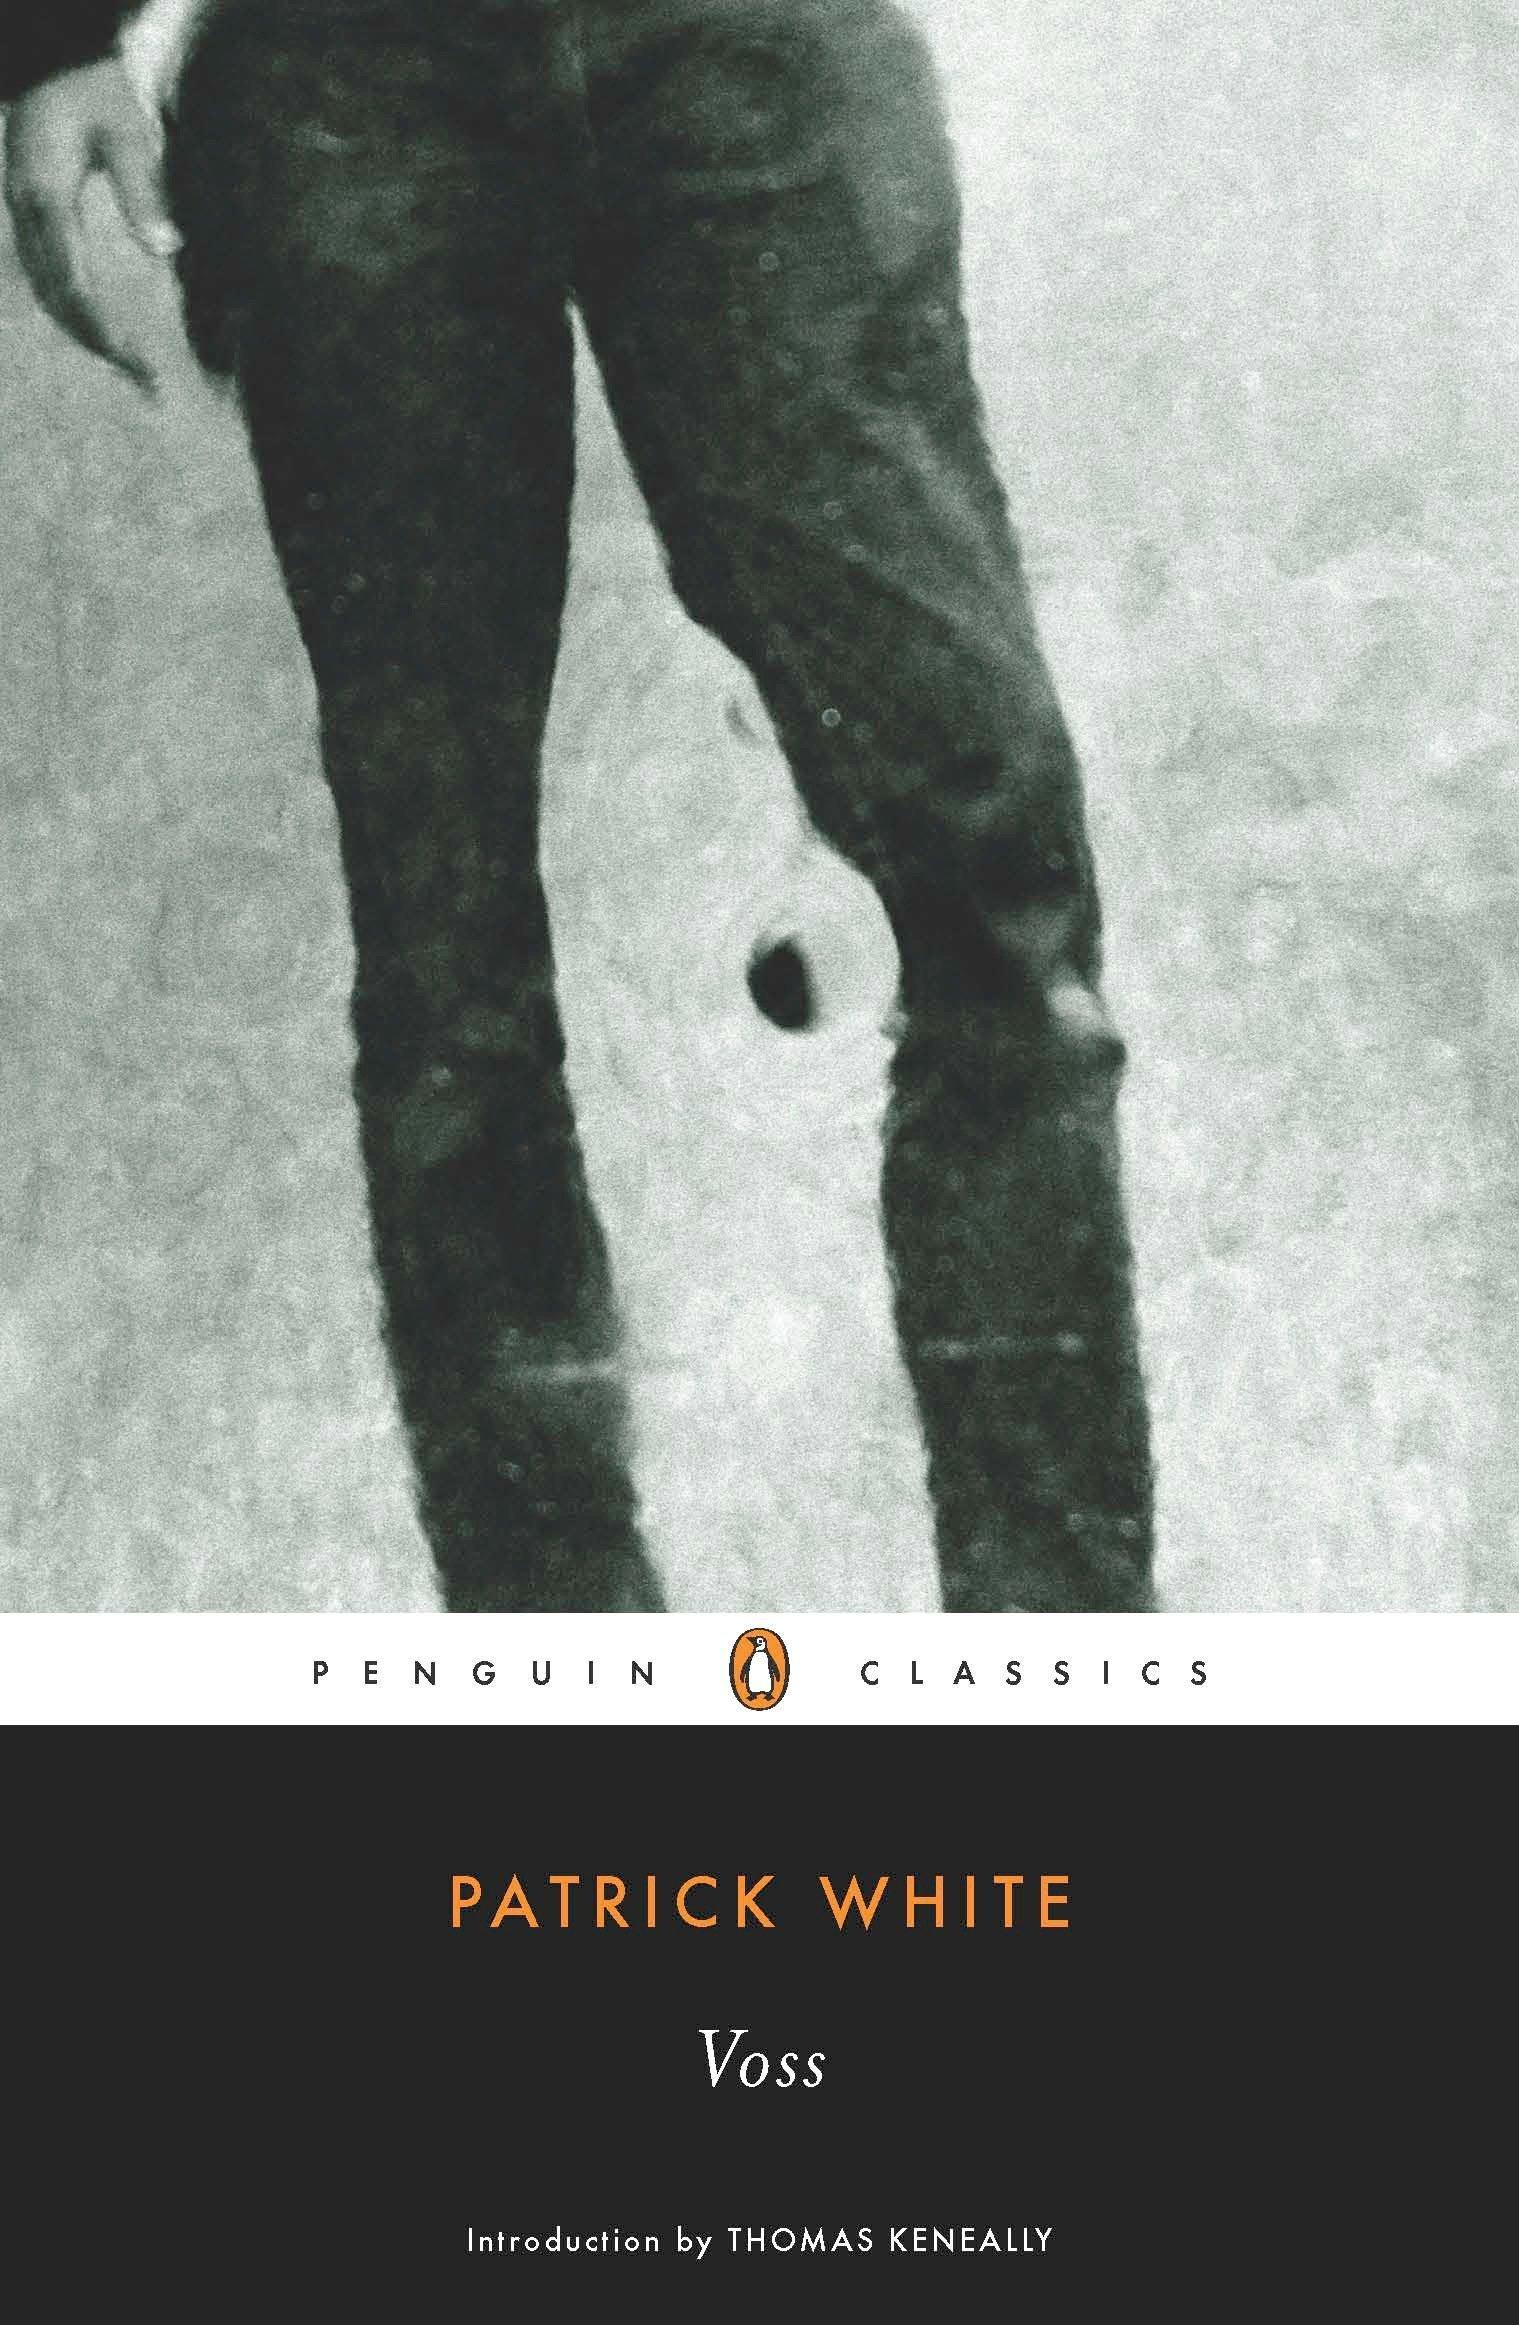 Voss Penguin Classics Patrick White Thomas Keneally